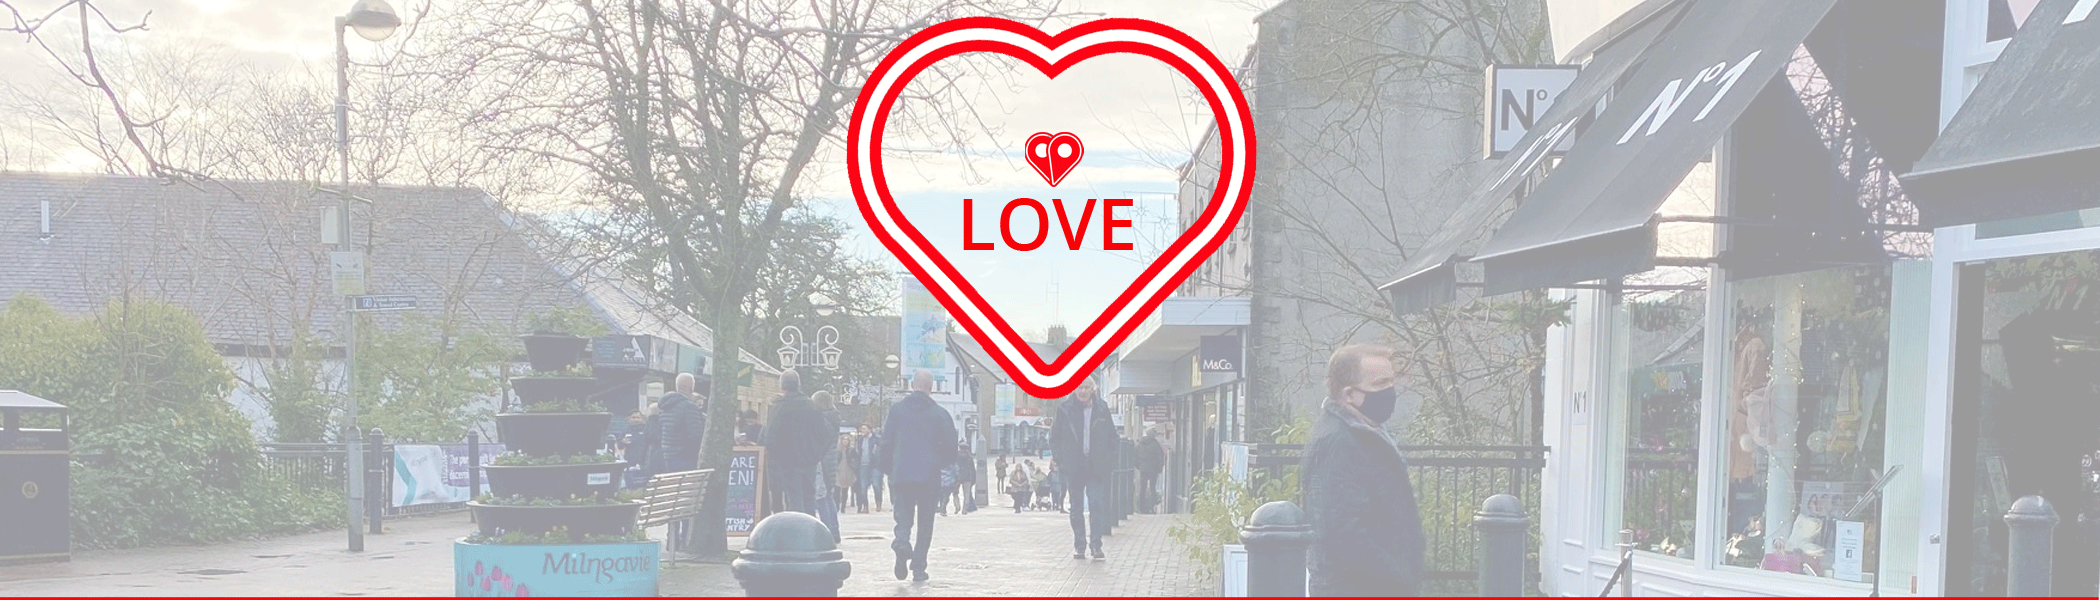 Valentines Feb 2021 Milngavie